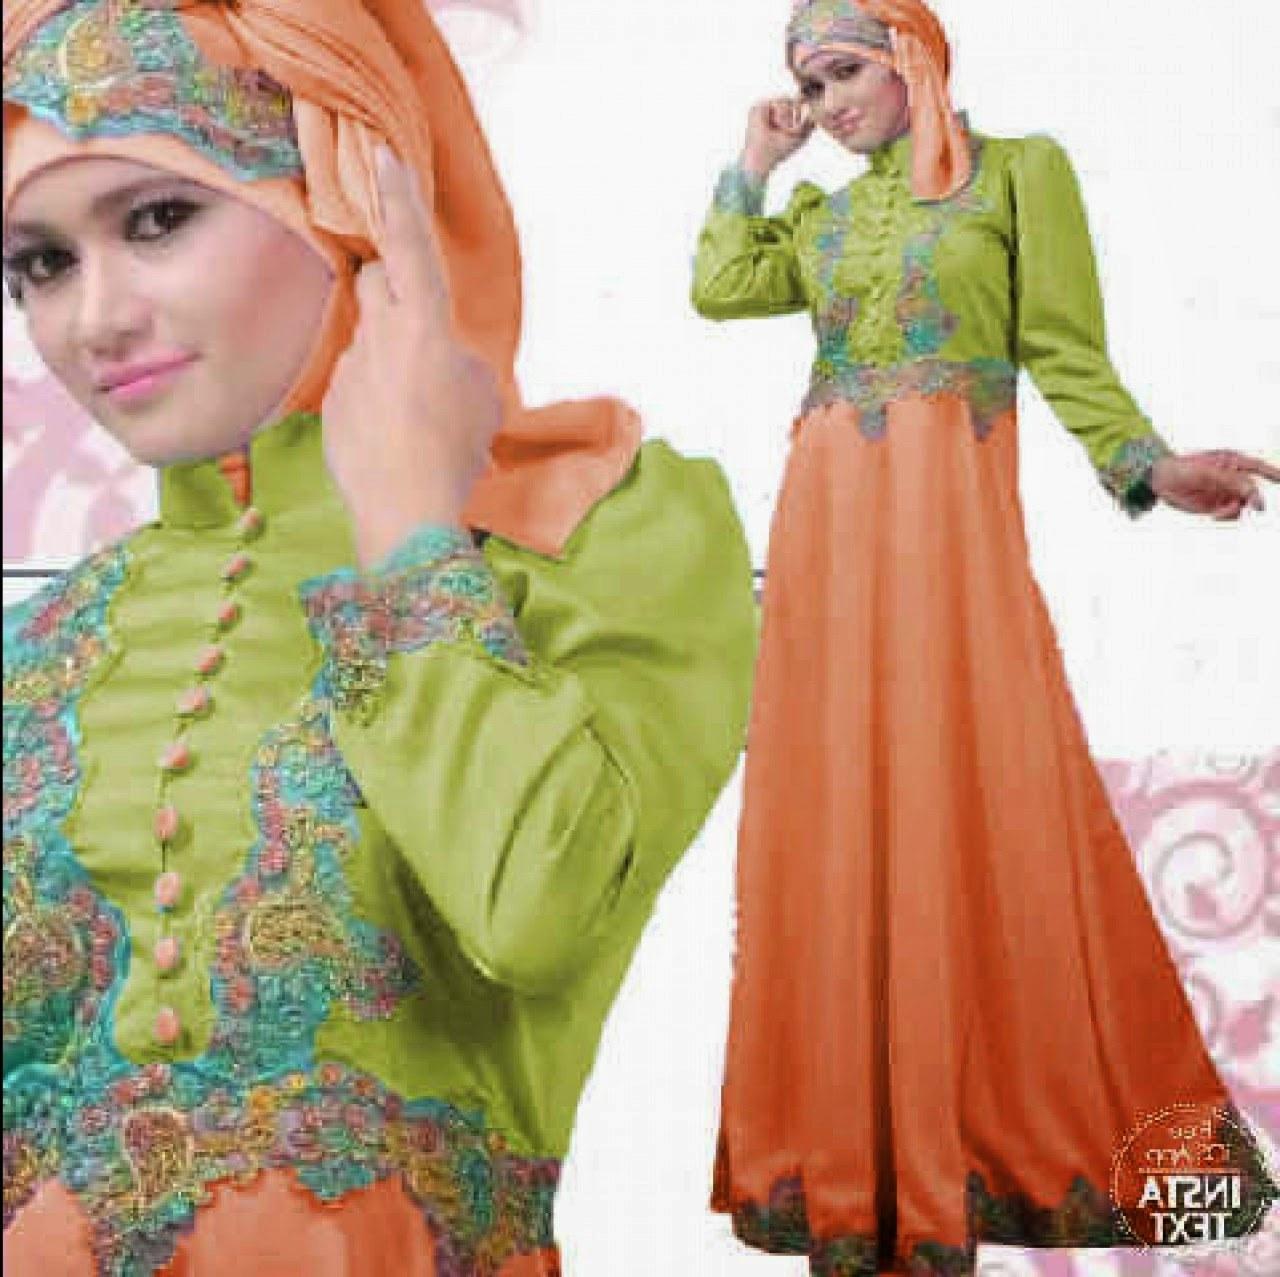 Model Foto Model Baju Lebaran 2018 Ffdn Kumpulan Foto Model Baju Kebaya Lebaran Terbaru 2018